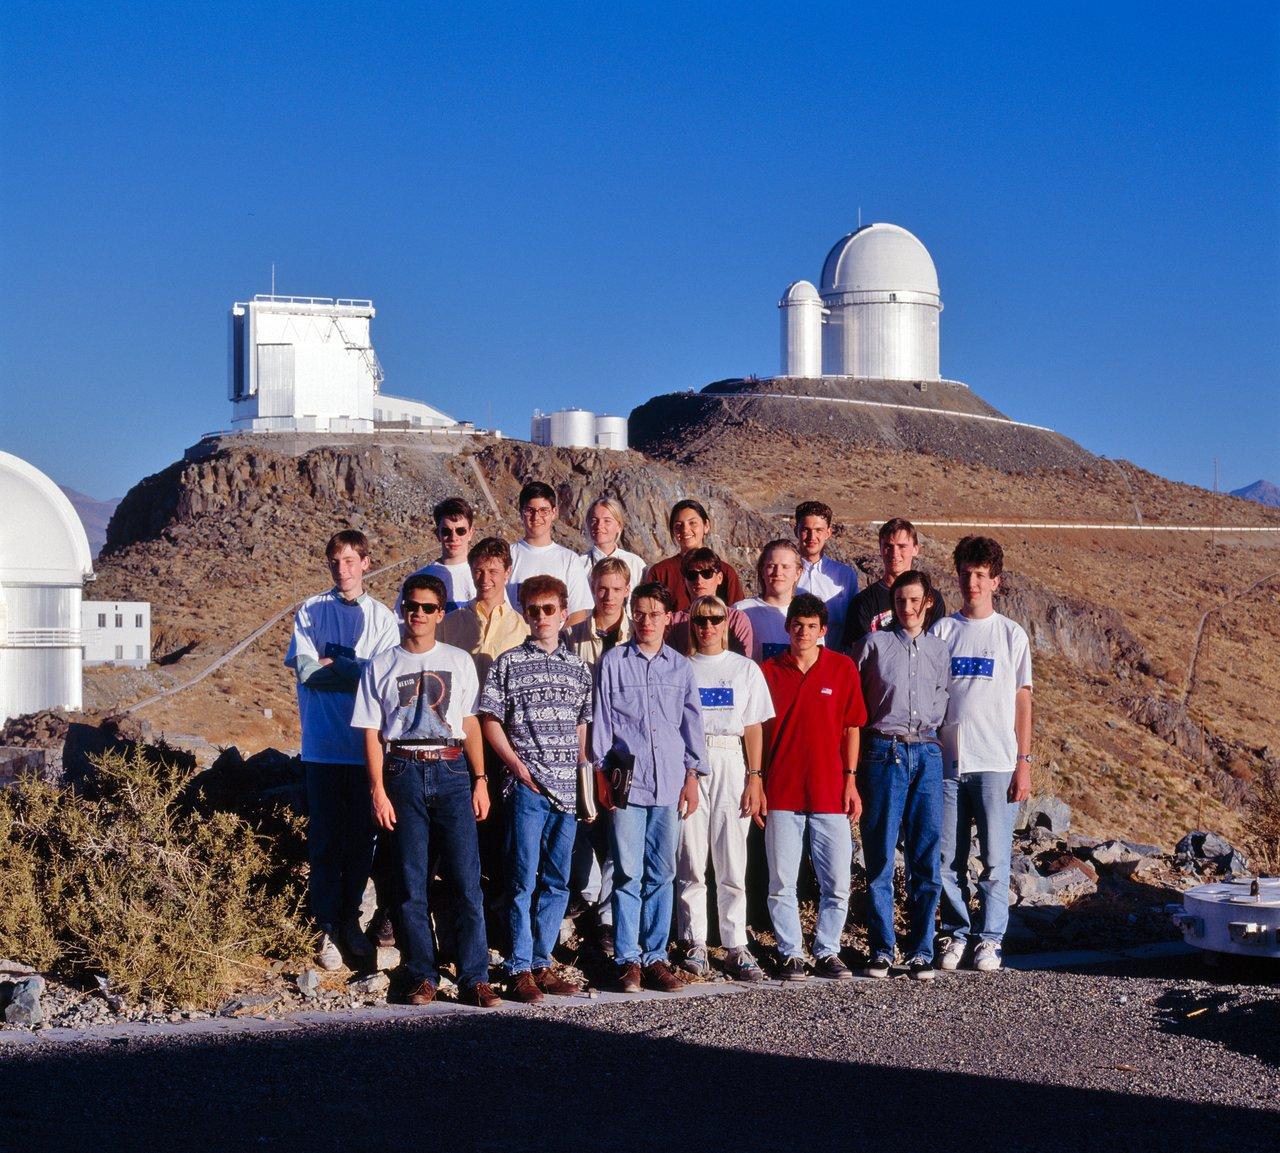 Young astronomers at La Silla